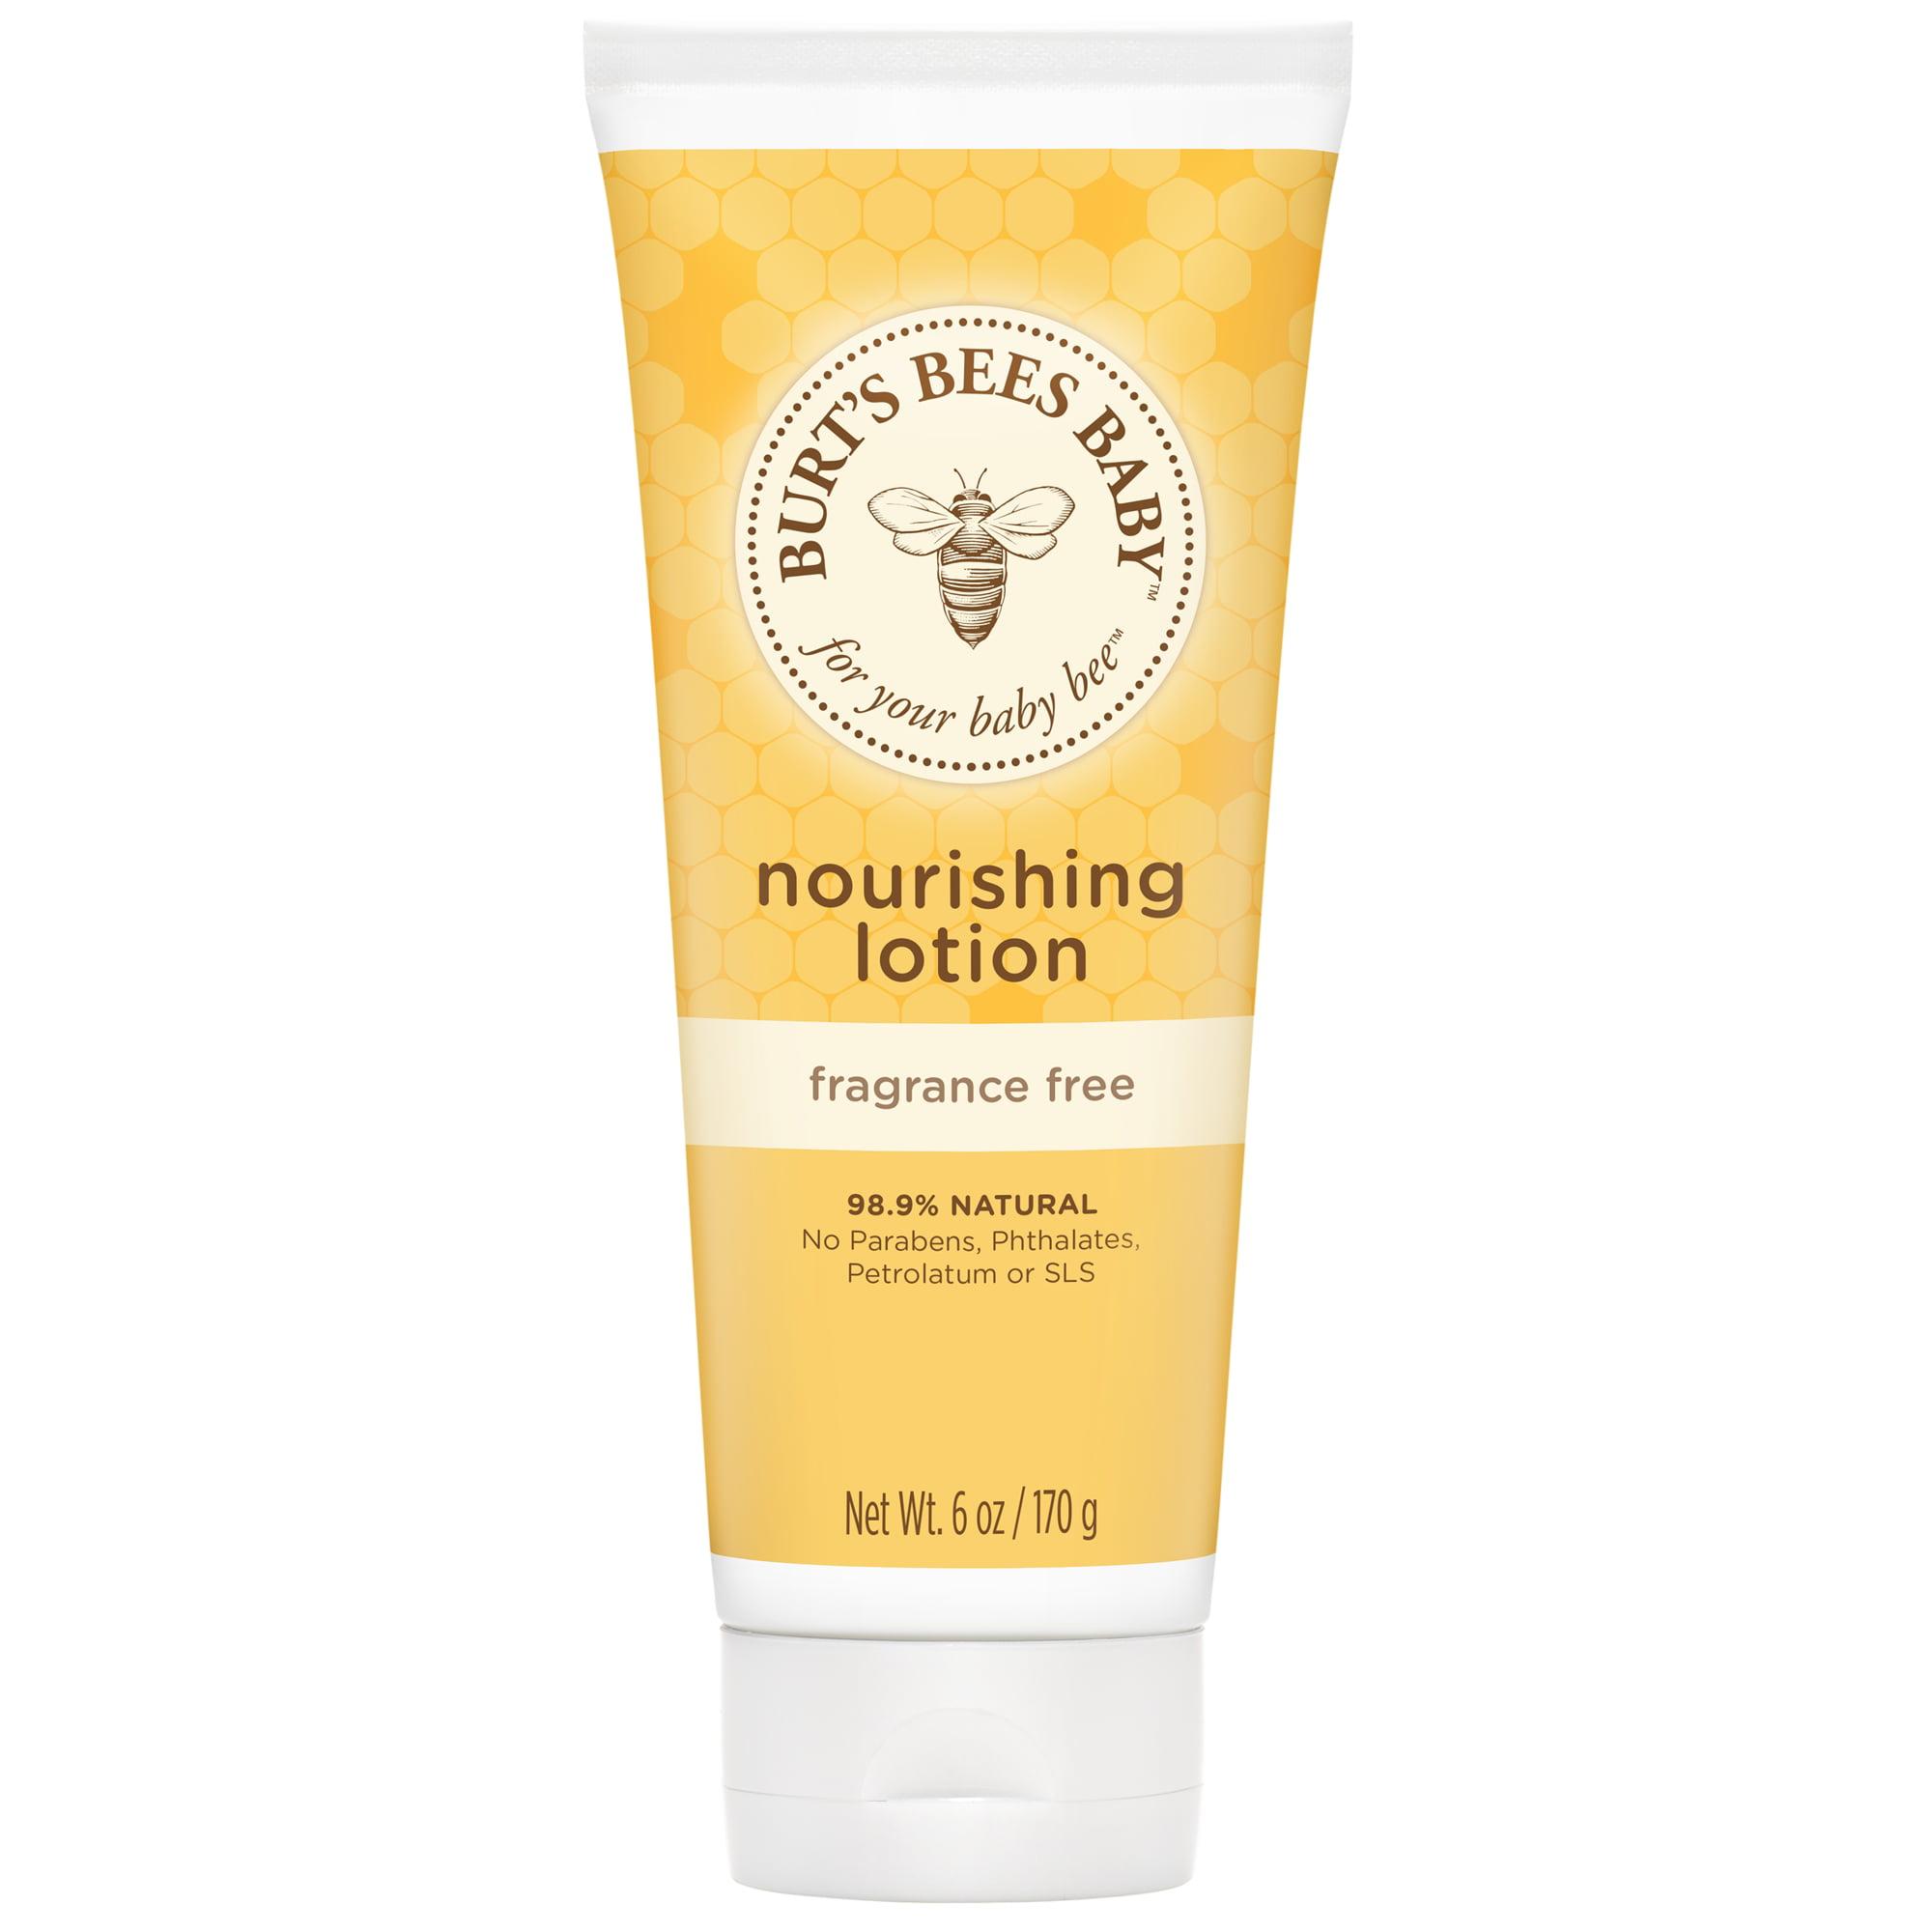 Burt's Bees Baby Nourishing Lotion, Fragrance Free Baby Lotion - 6 oz Tube